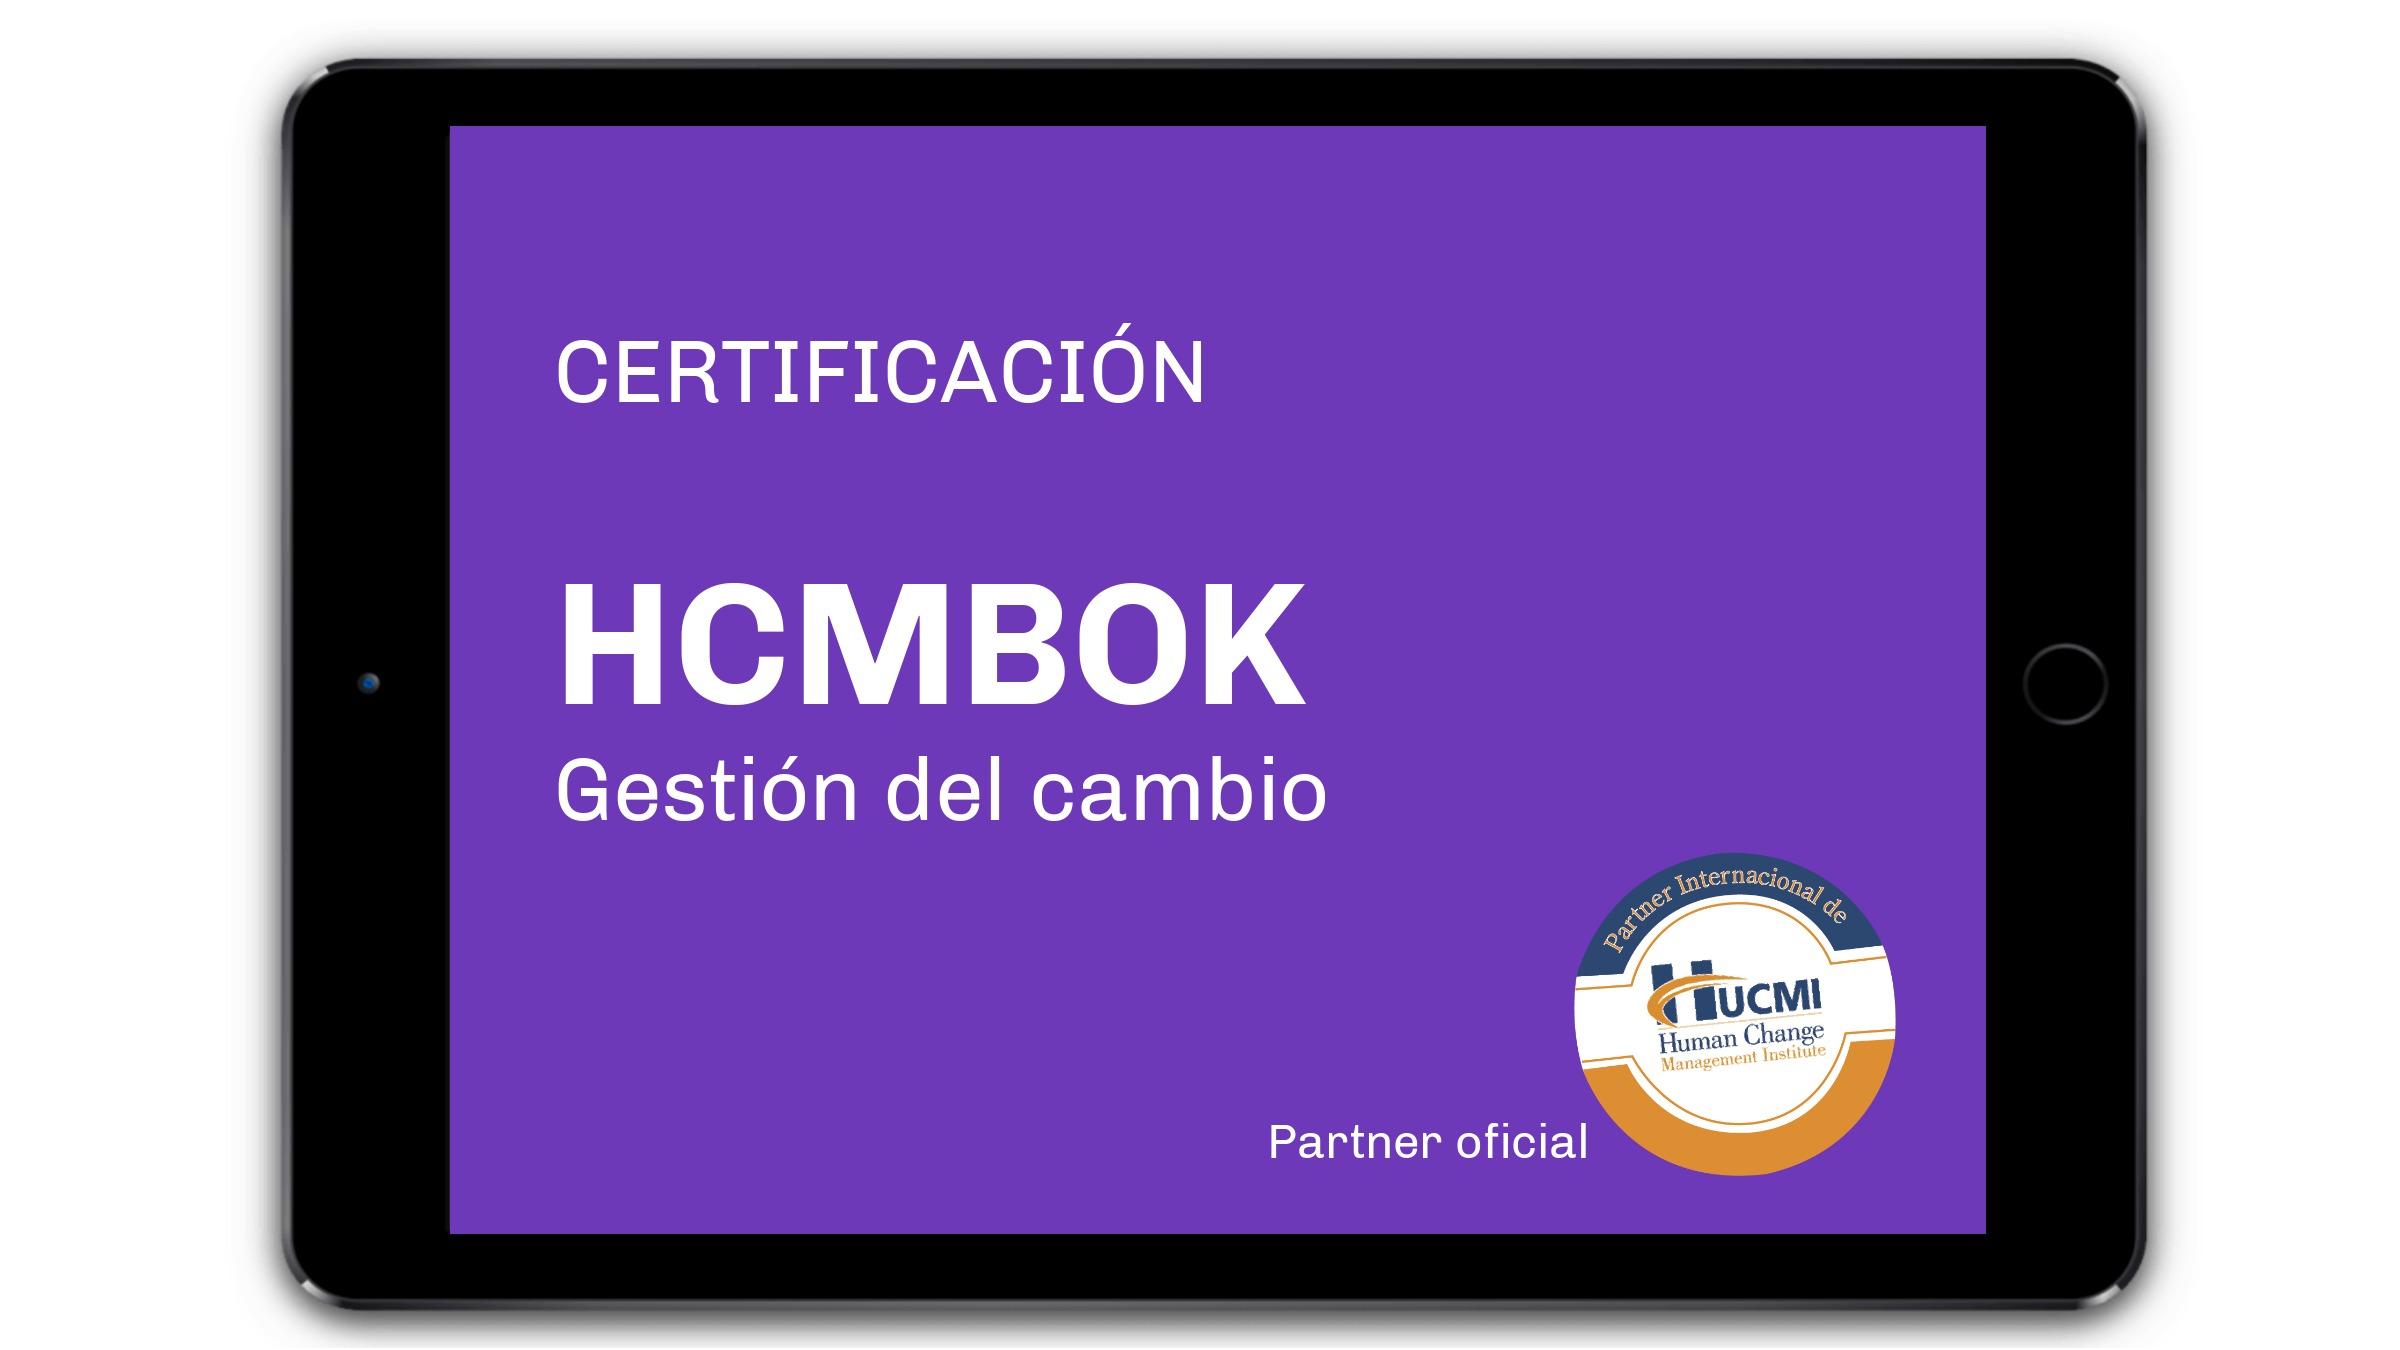 HCMBOK CERTIFICACION PROFESIONAL GESTION DEL CAMBIO iMm Instituto HUCMI España Portugal Change Management